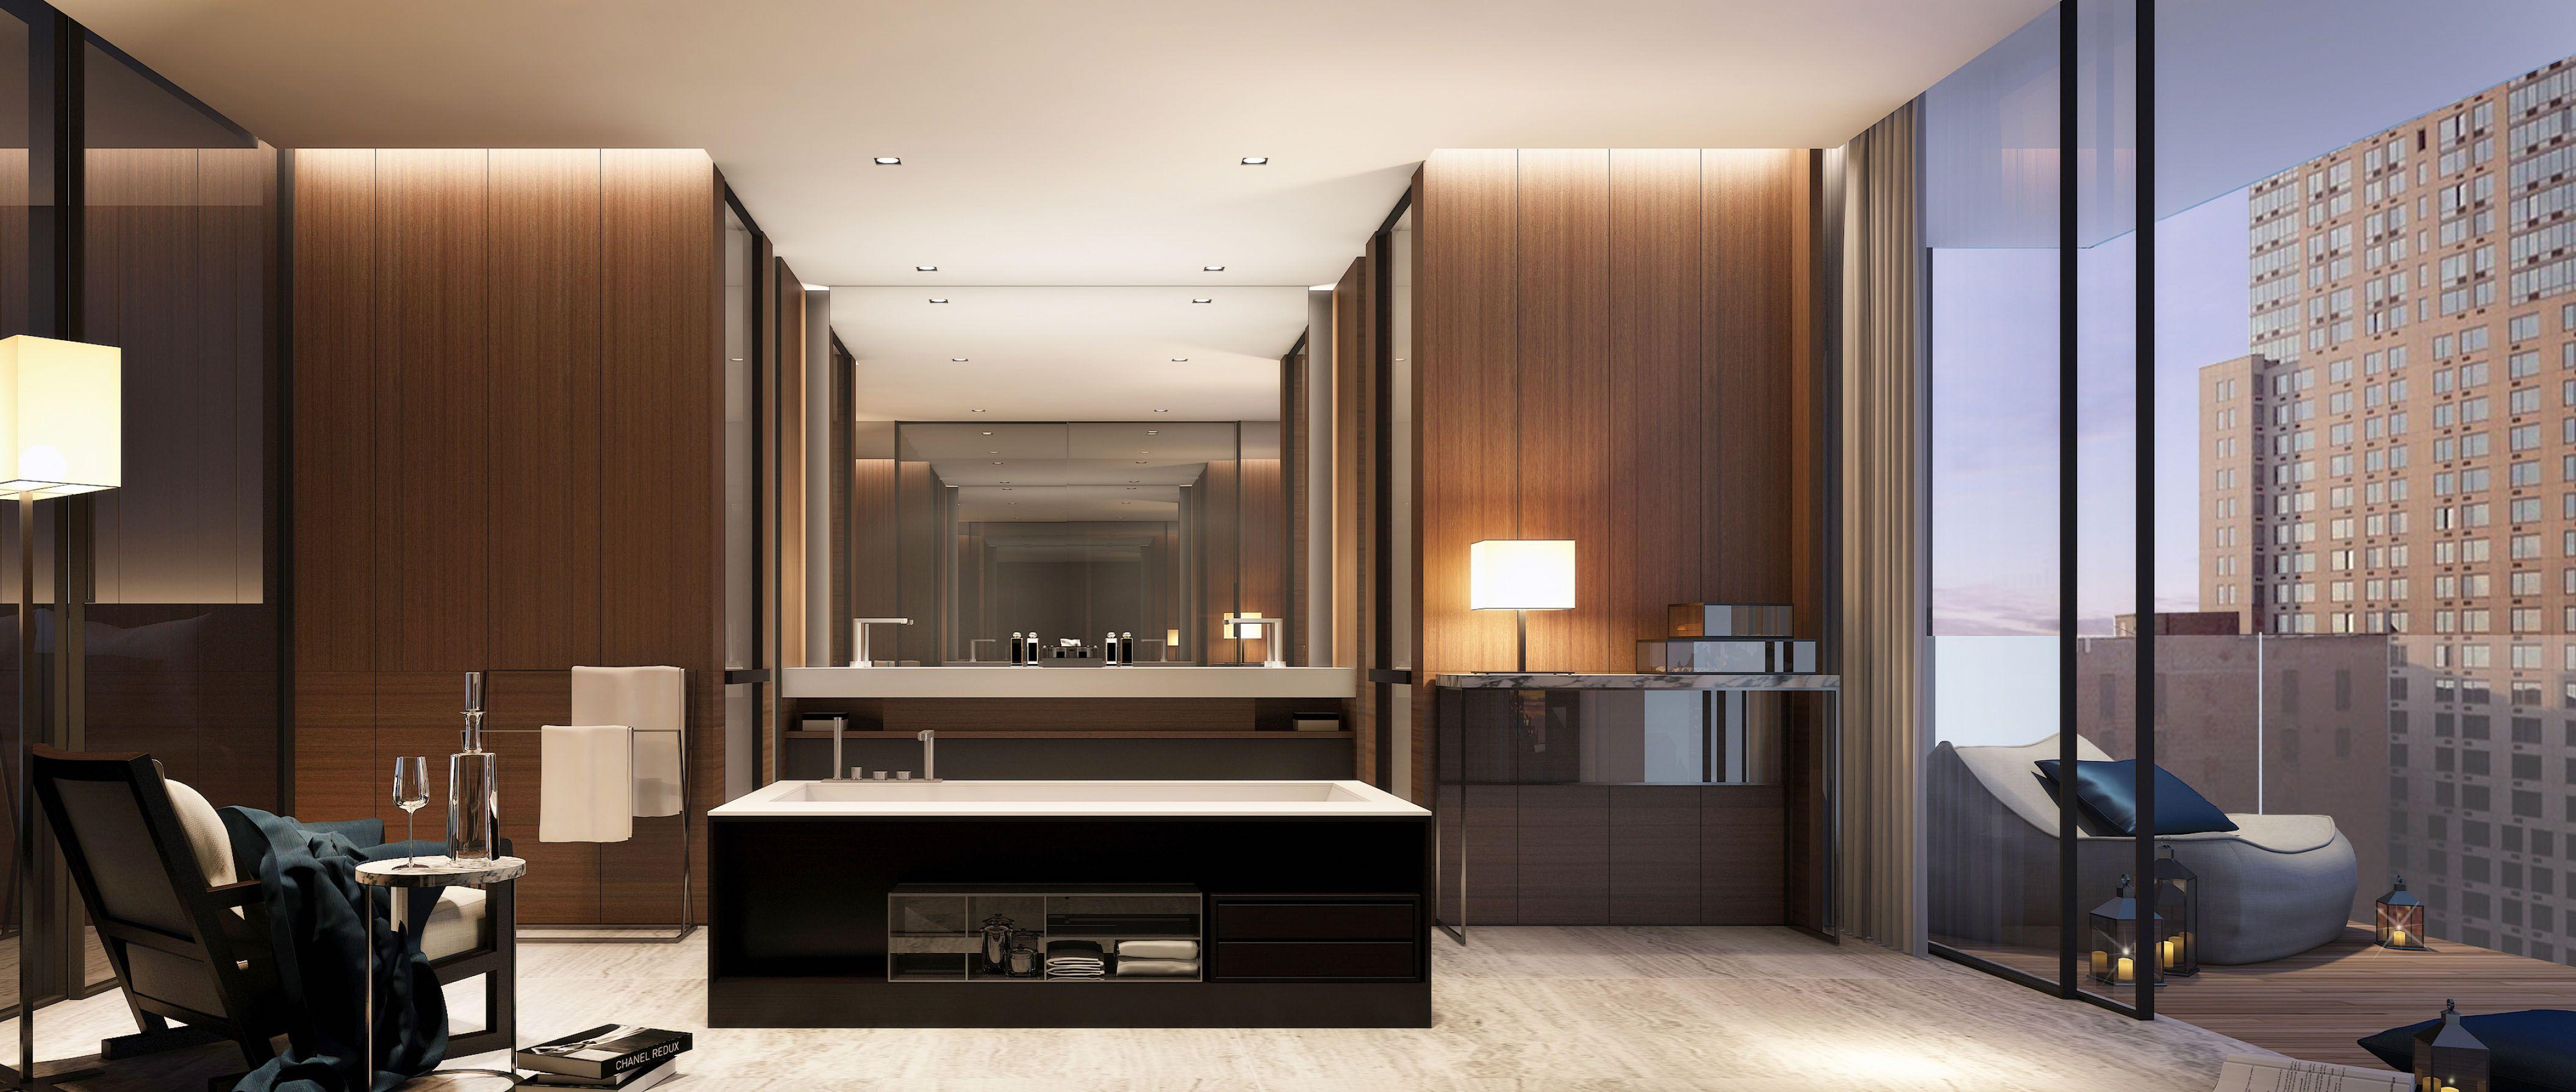 SCDA Soori High Line New York Luxury Residences